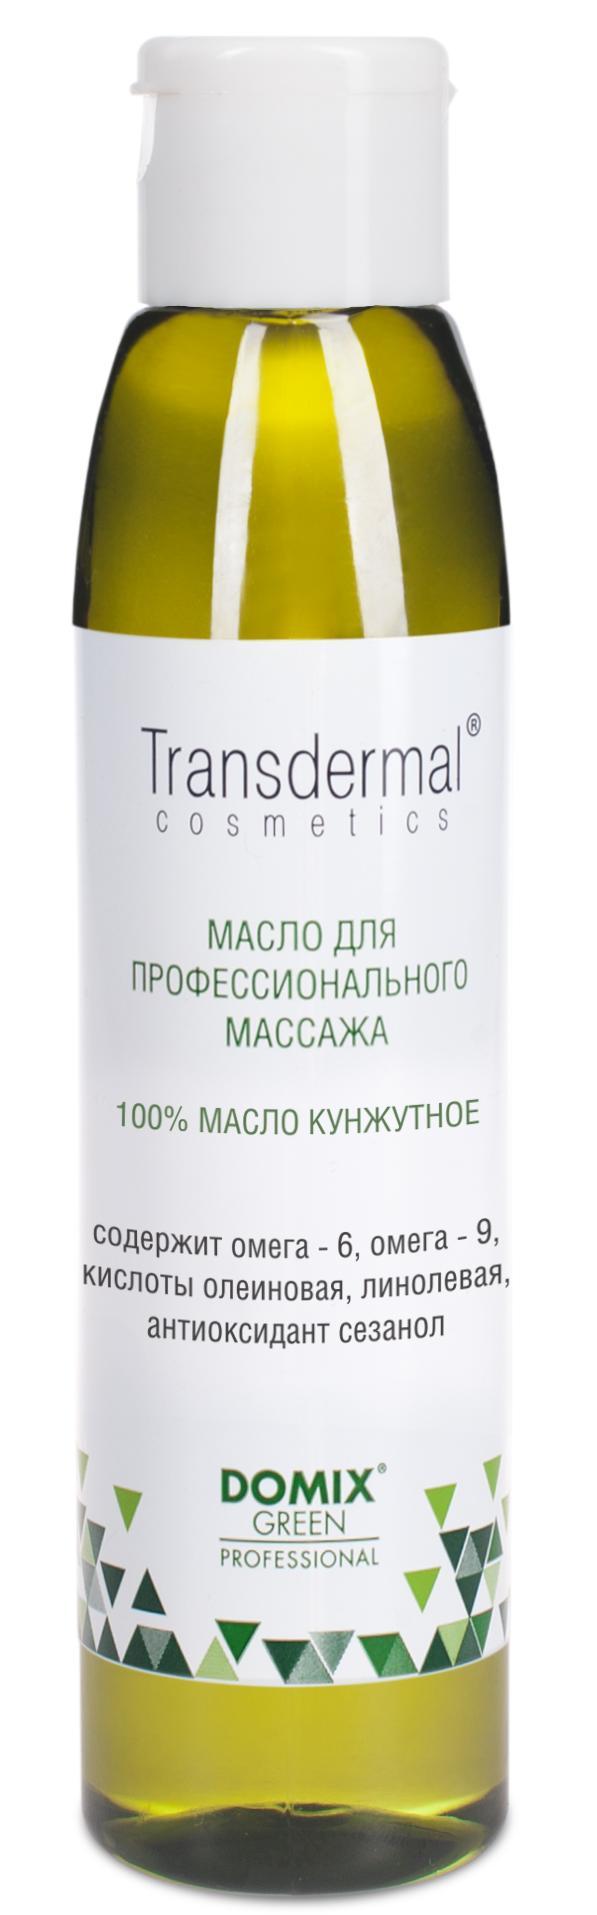 DOMIX GREEN PROFESSIONAL Масло кунжутное, без отдушек / TRANSDERMAL COSMETICS 136 мл